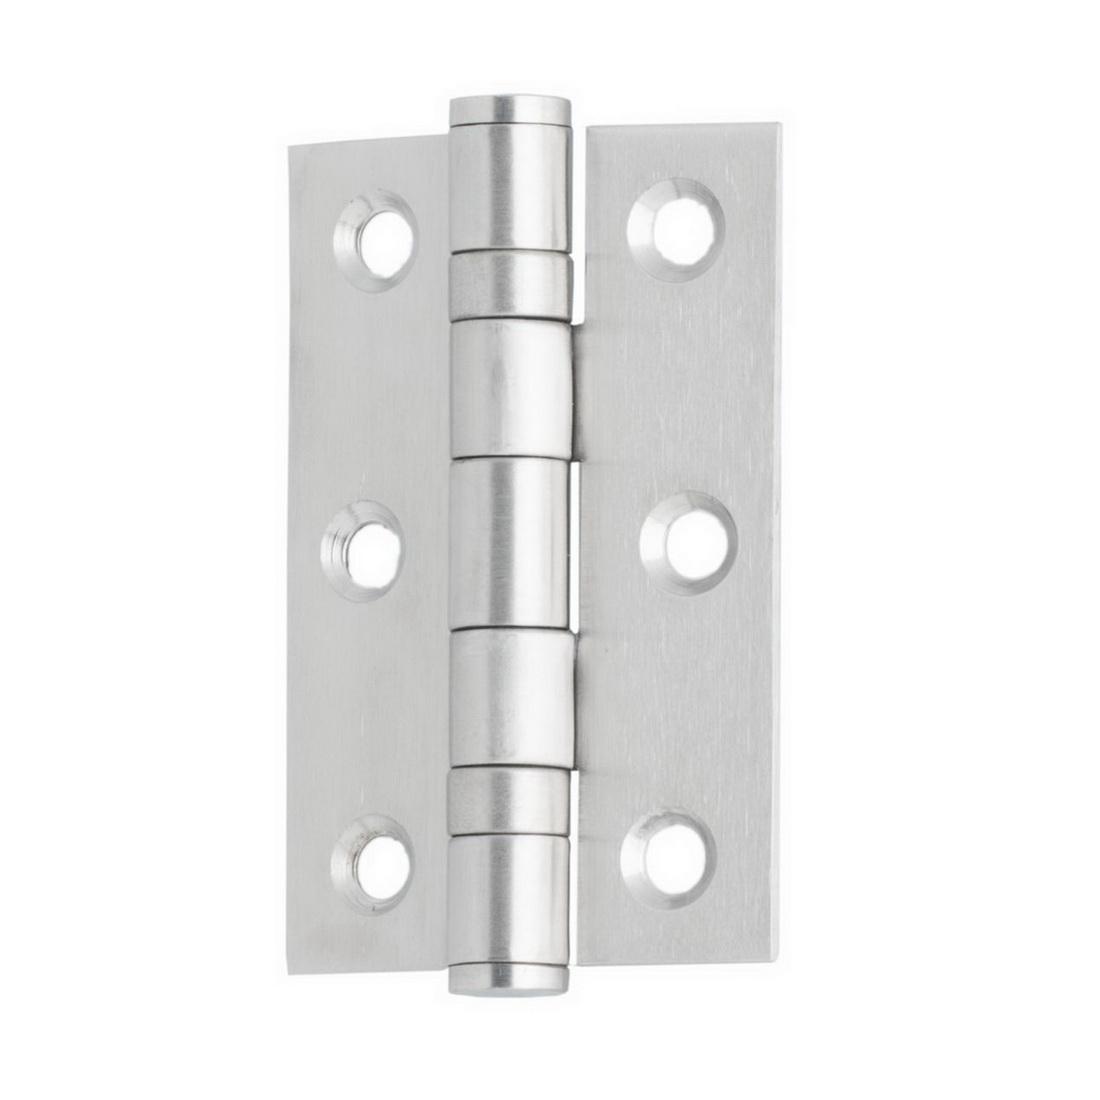 Square Edge Door Hinge 75 x 50 x 2mm 316 Stainless Steel 520SSH7550316S